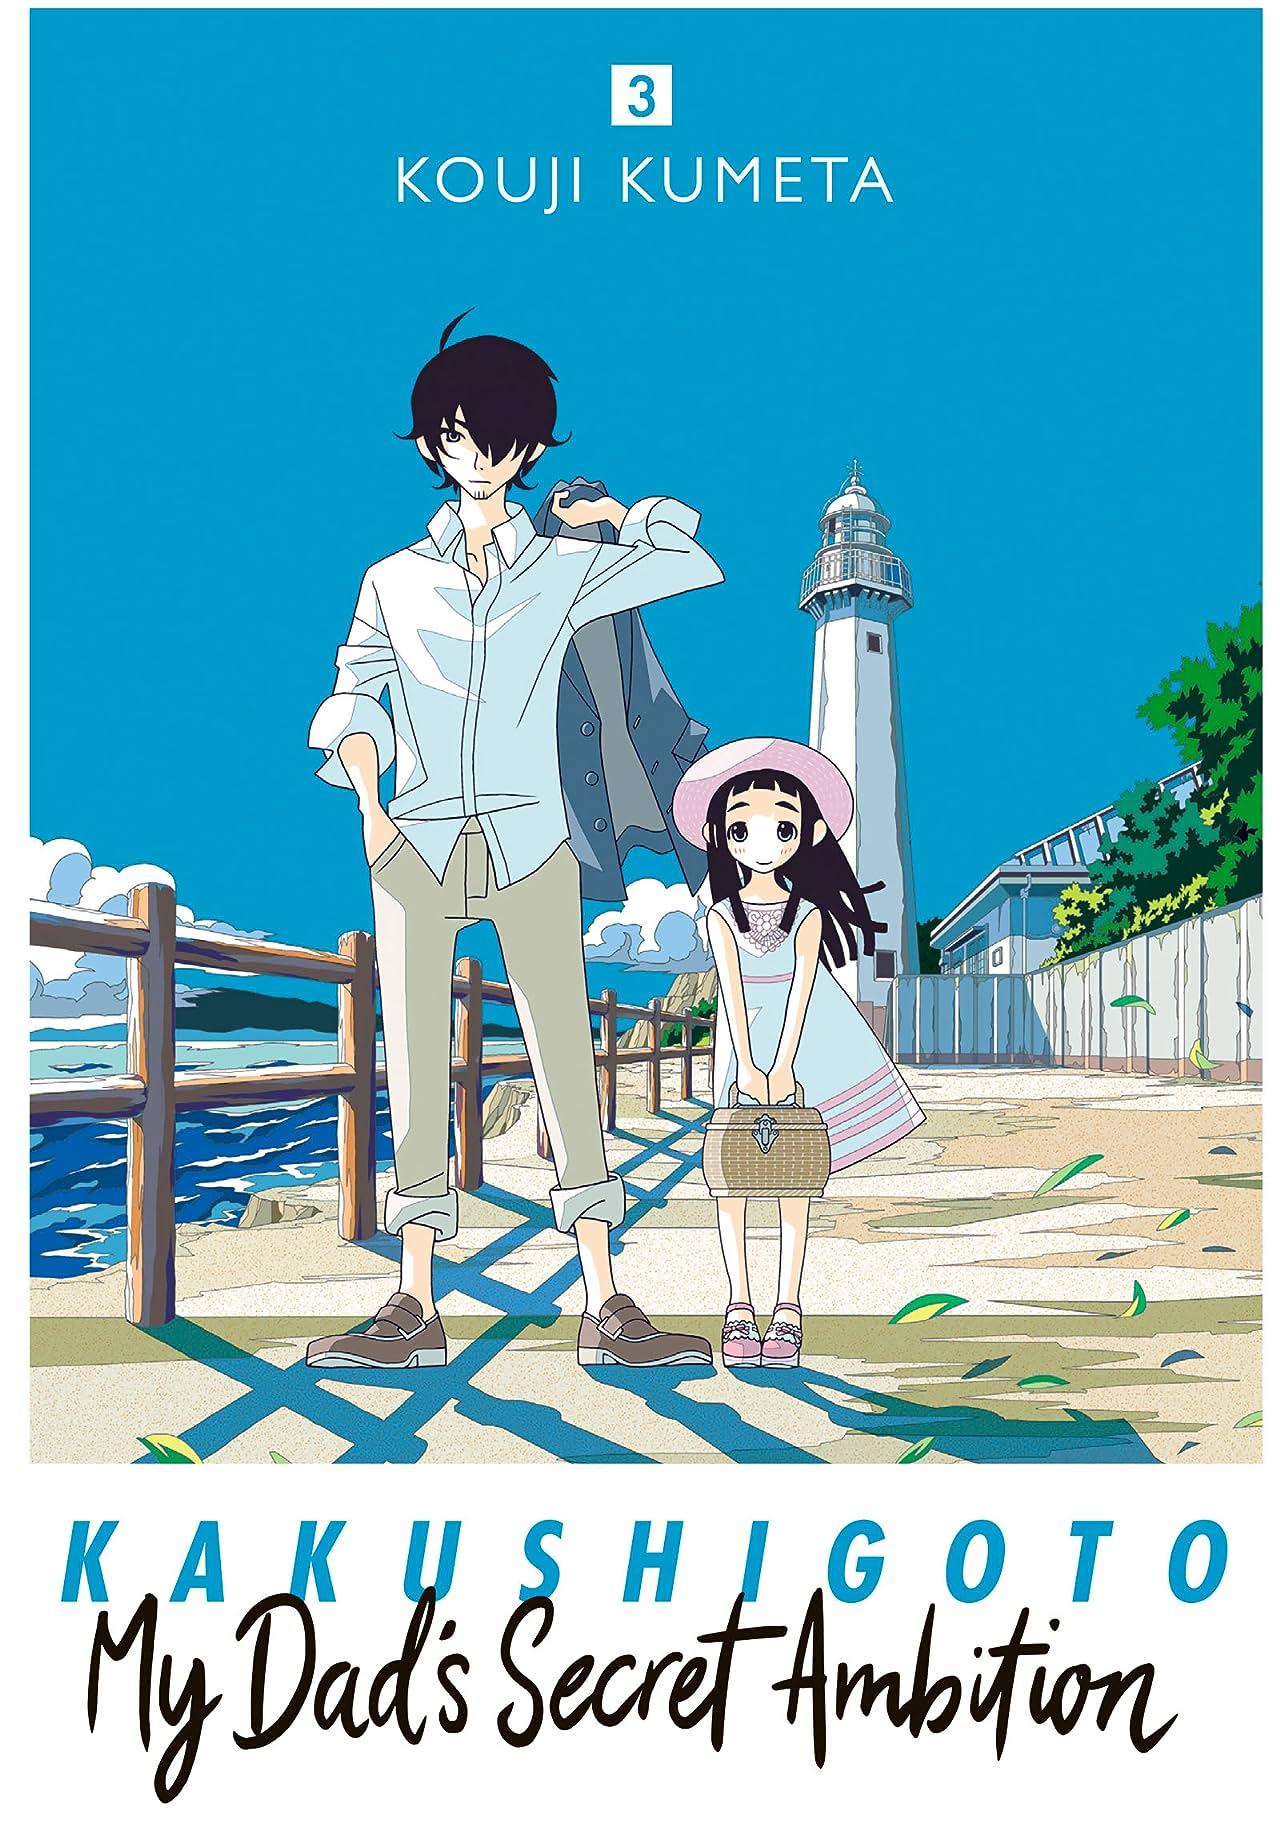 Kakushigoto: My Dad's Secret Ambition Vol. 3